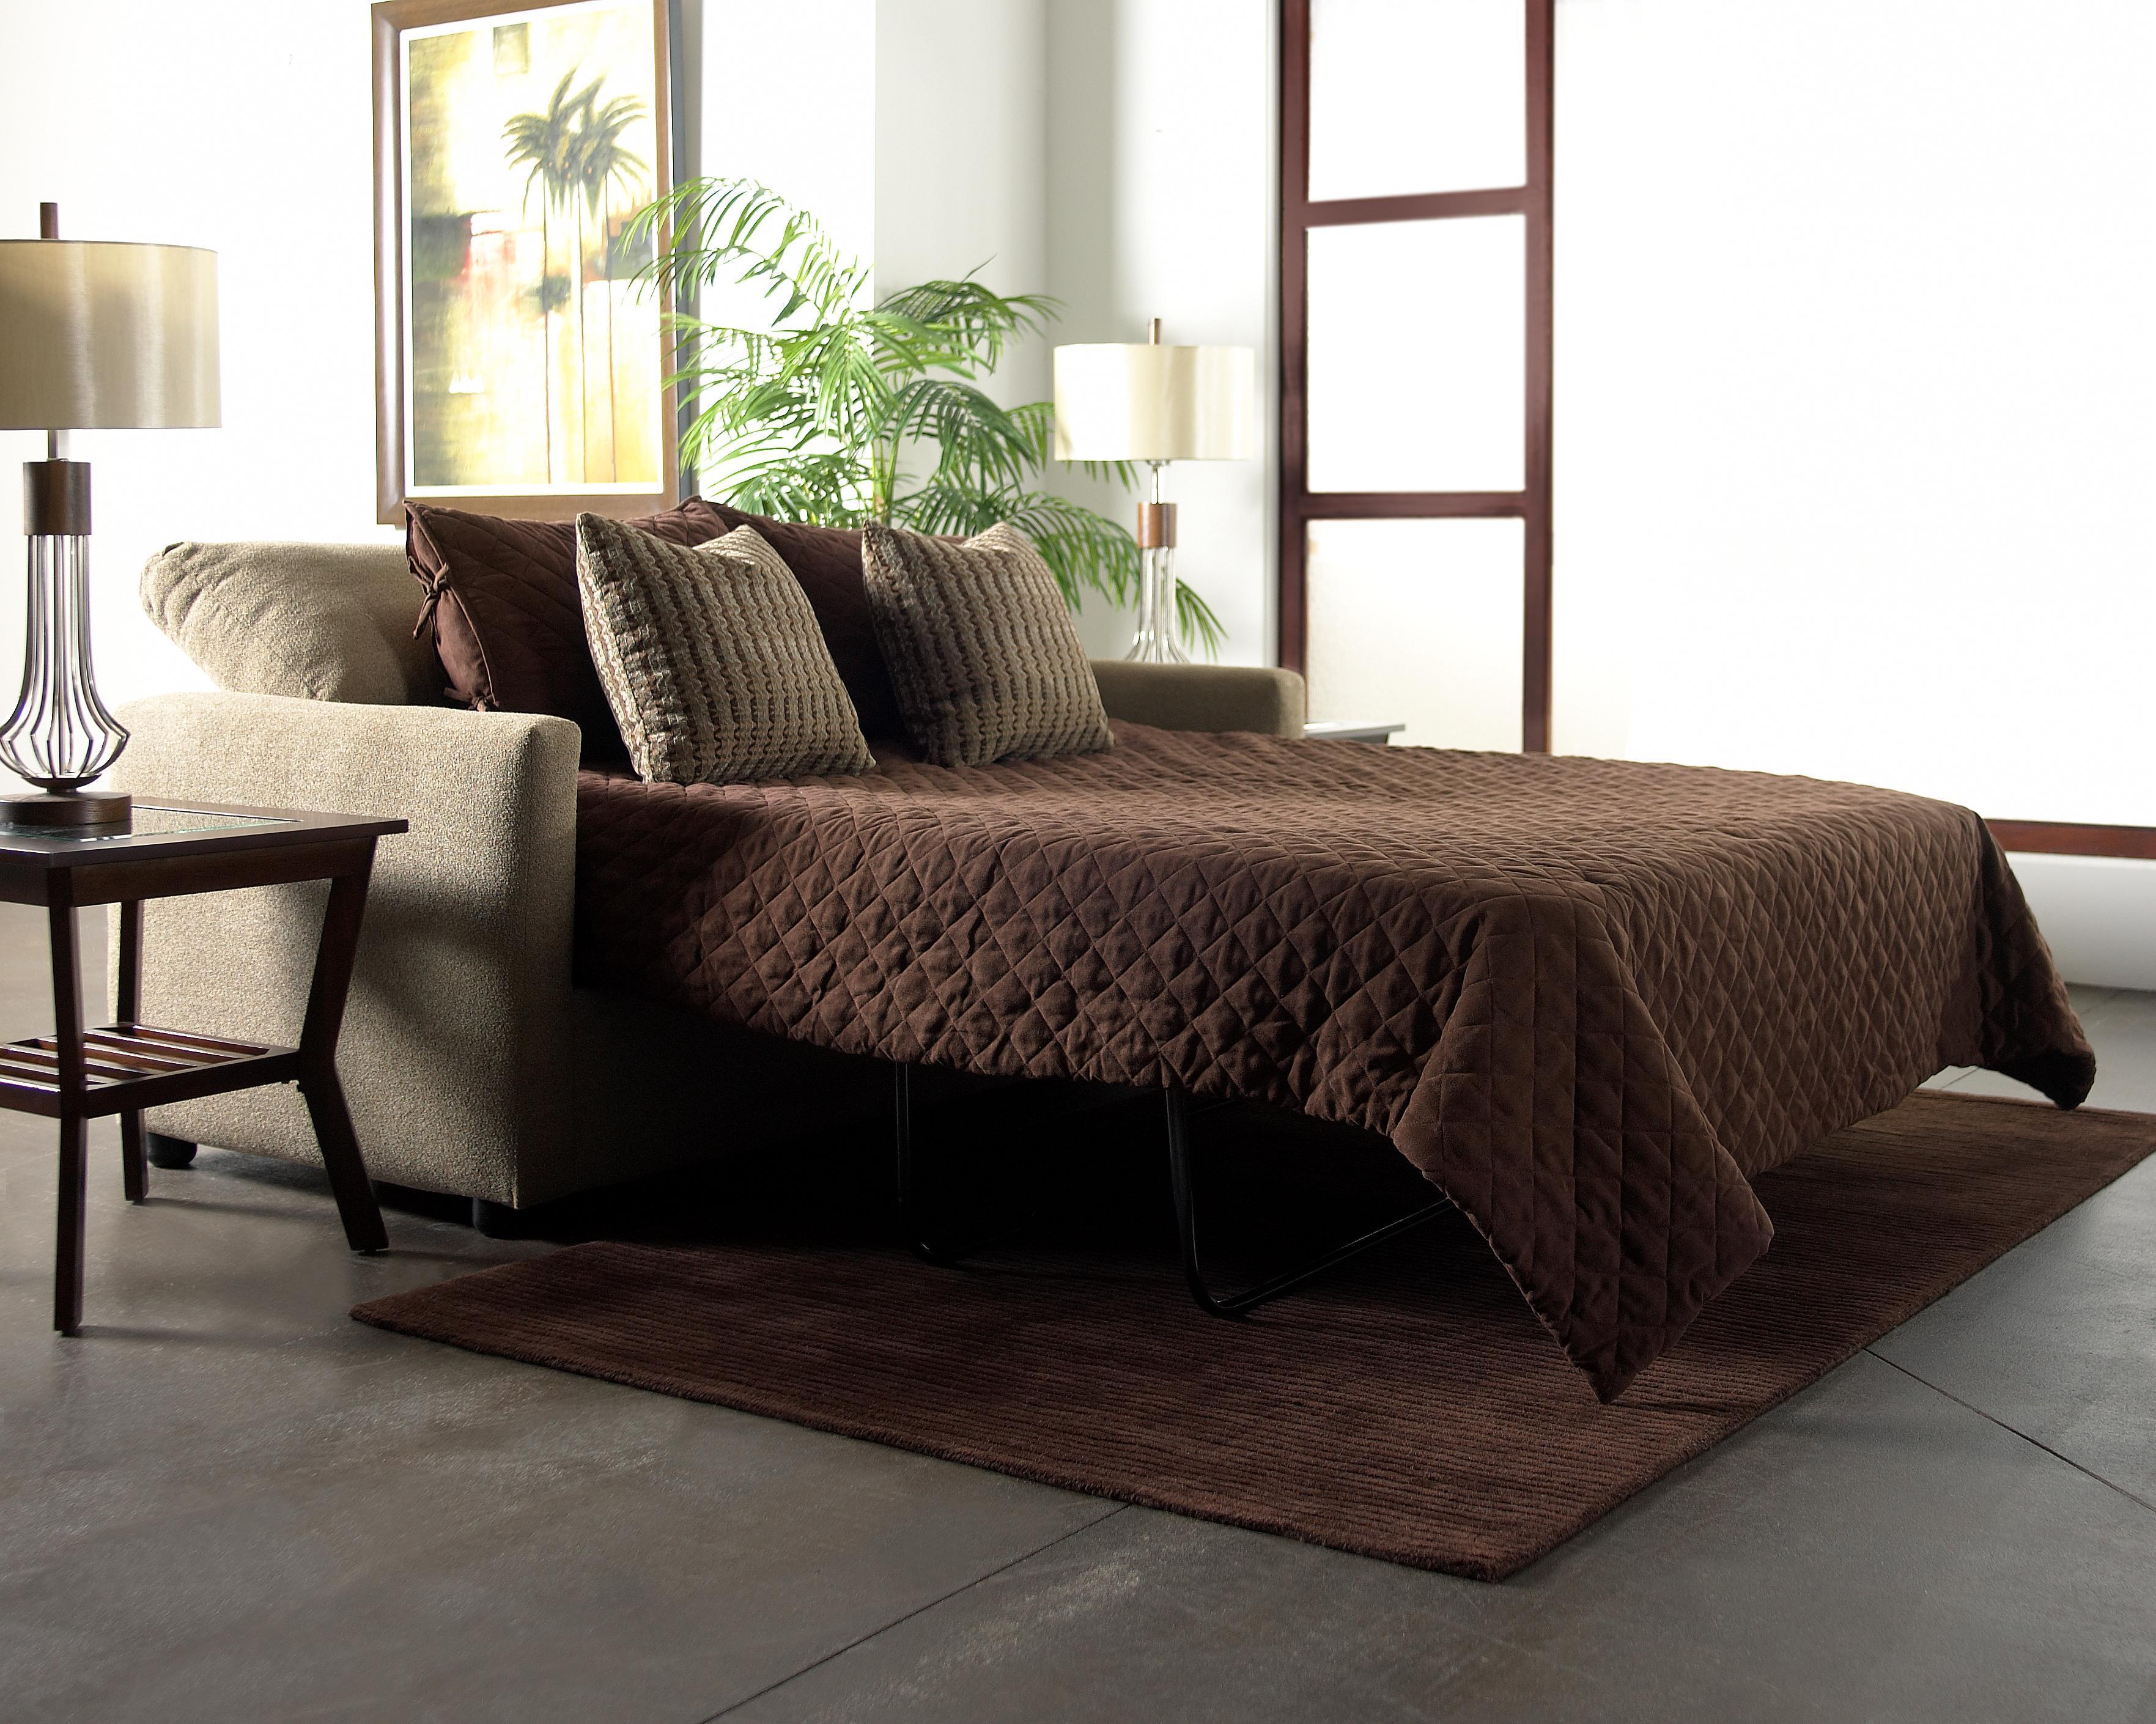 Klaussner Jacobs Regular Full Size Sleeper Sofa